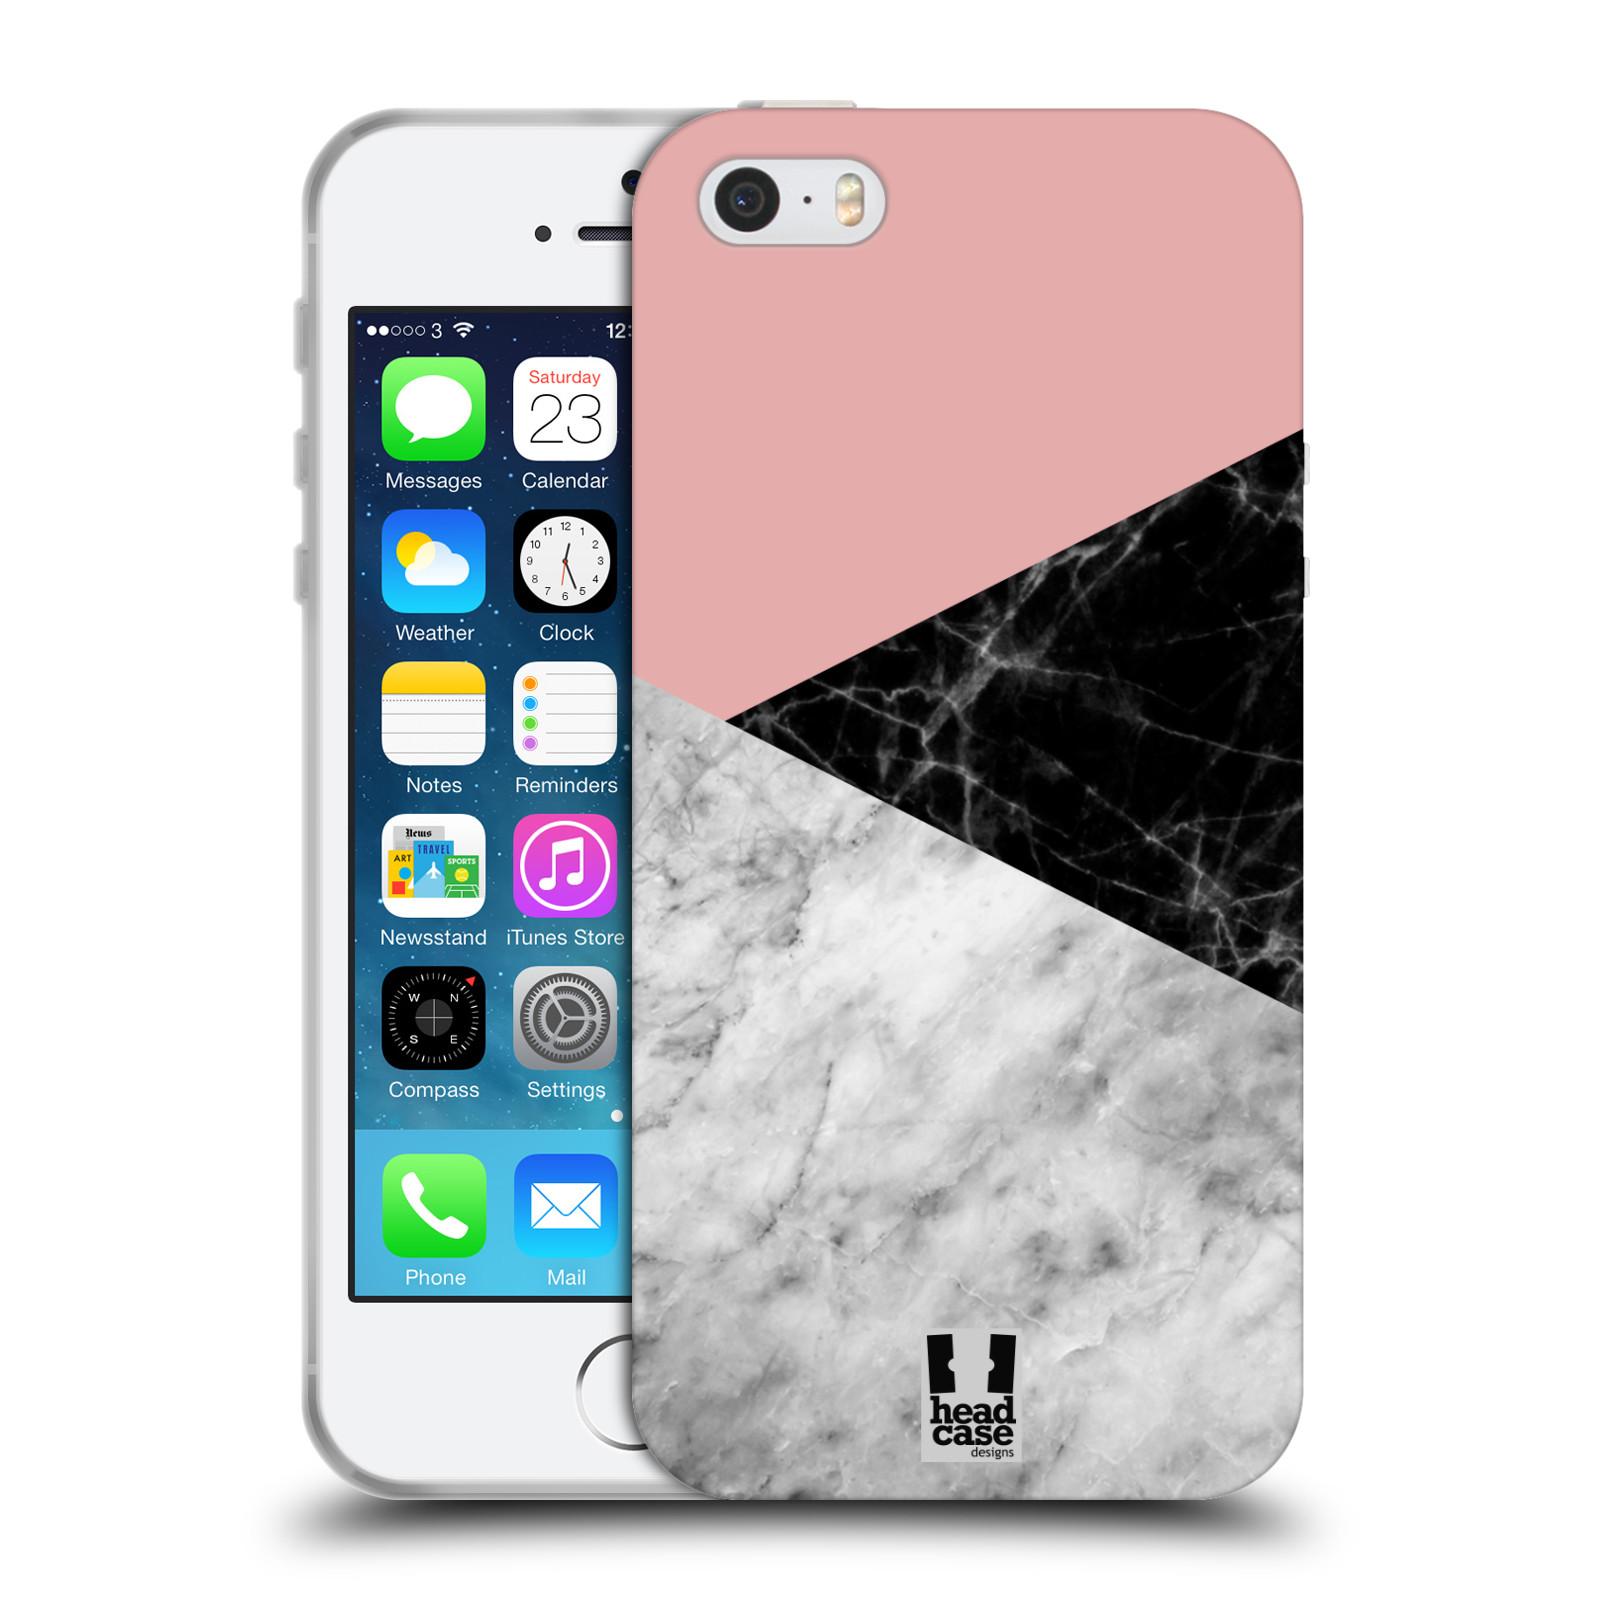 Silikonové pouzdro na mobil Apple iPhone 5, 5S, SE - Head Case - Mramor mix